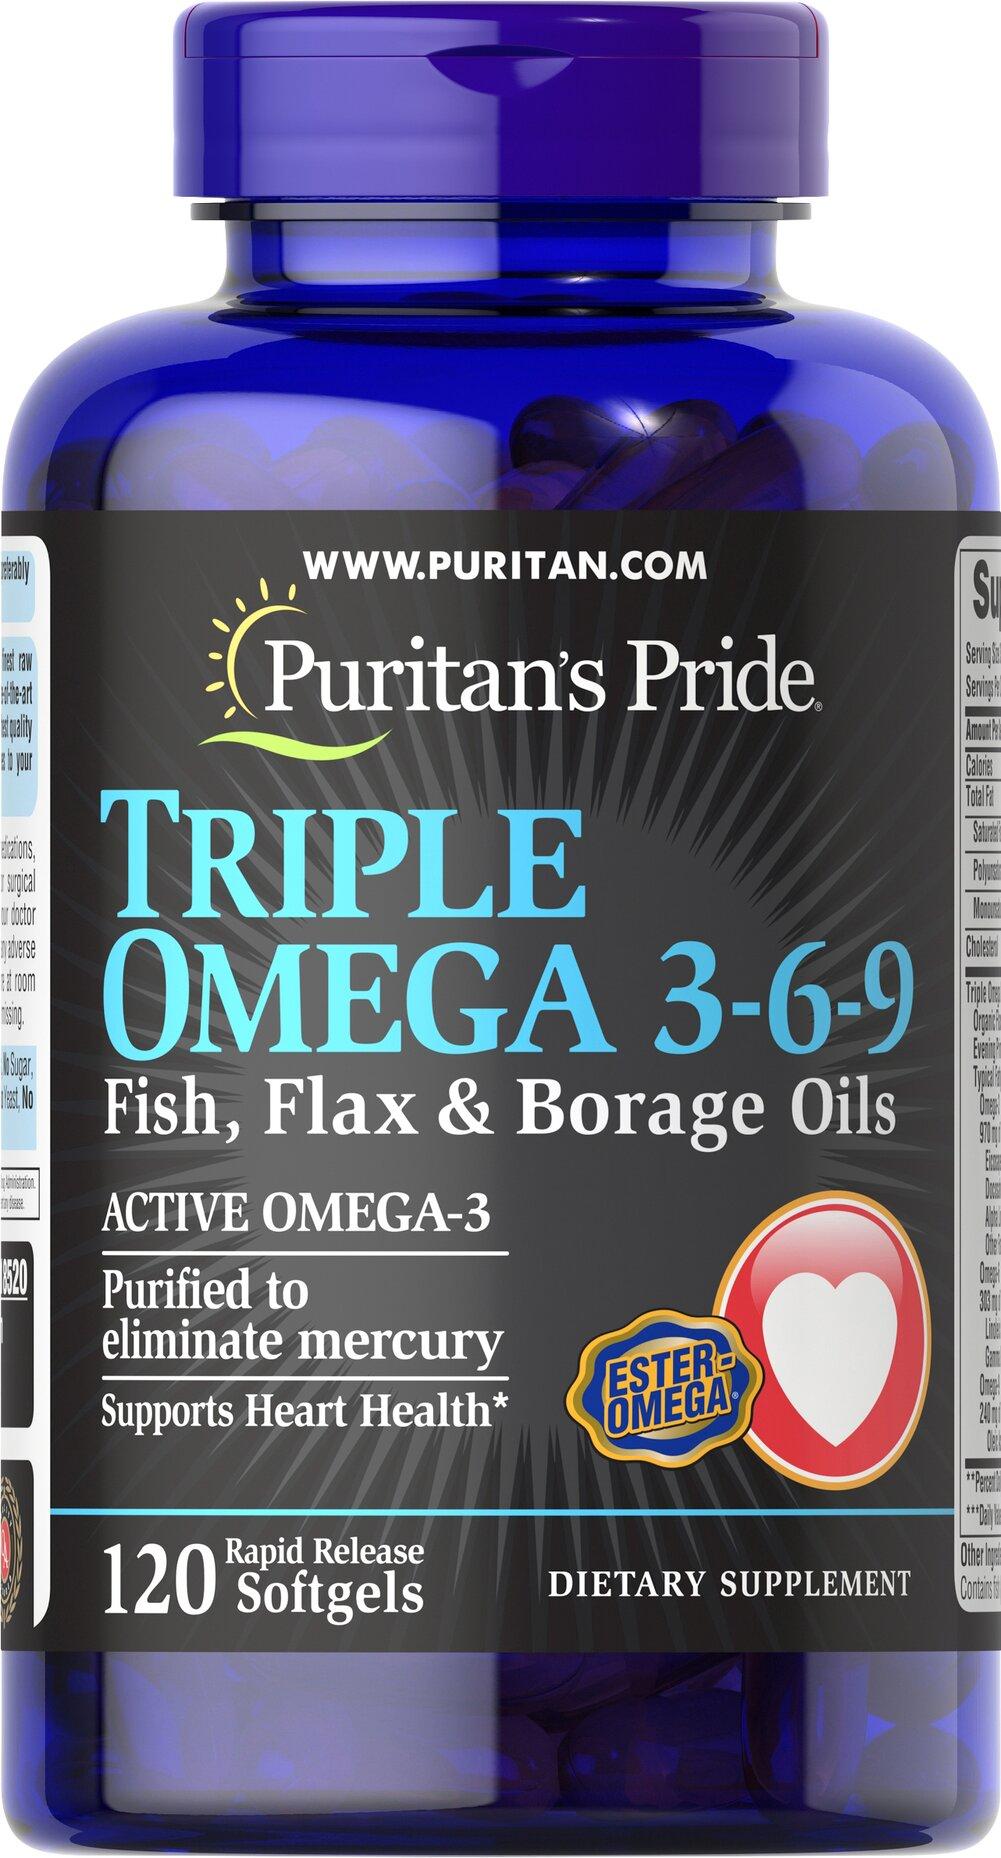 Puritan 39 s pride triple omega 3 6 9 fish flax borage for Flaxseed oil or fish oil